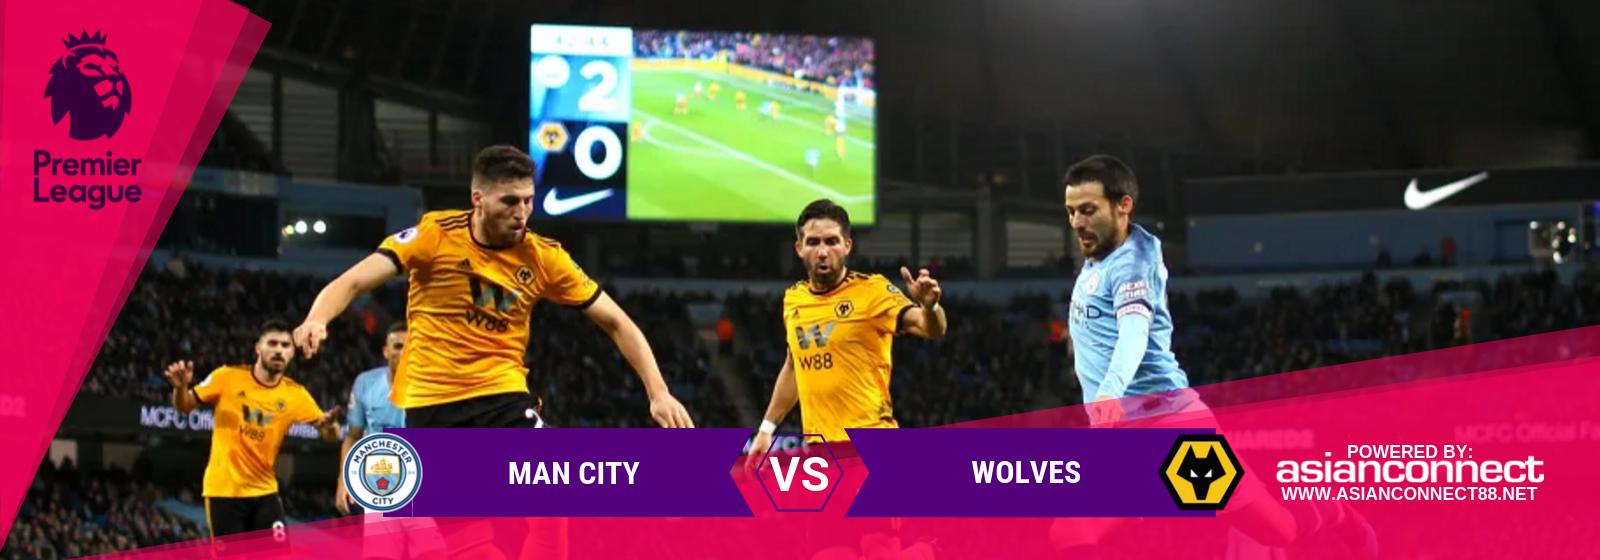 EPL Man City Vs. Wolves Asian Connect